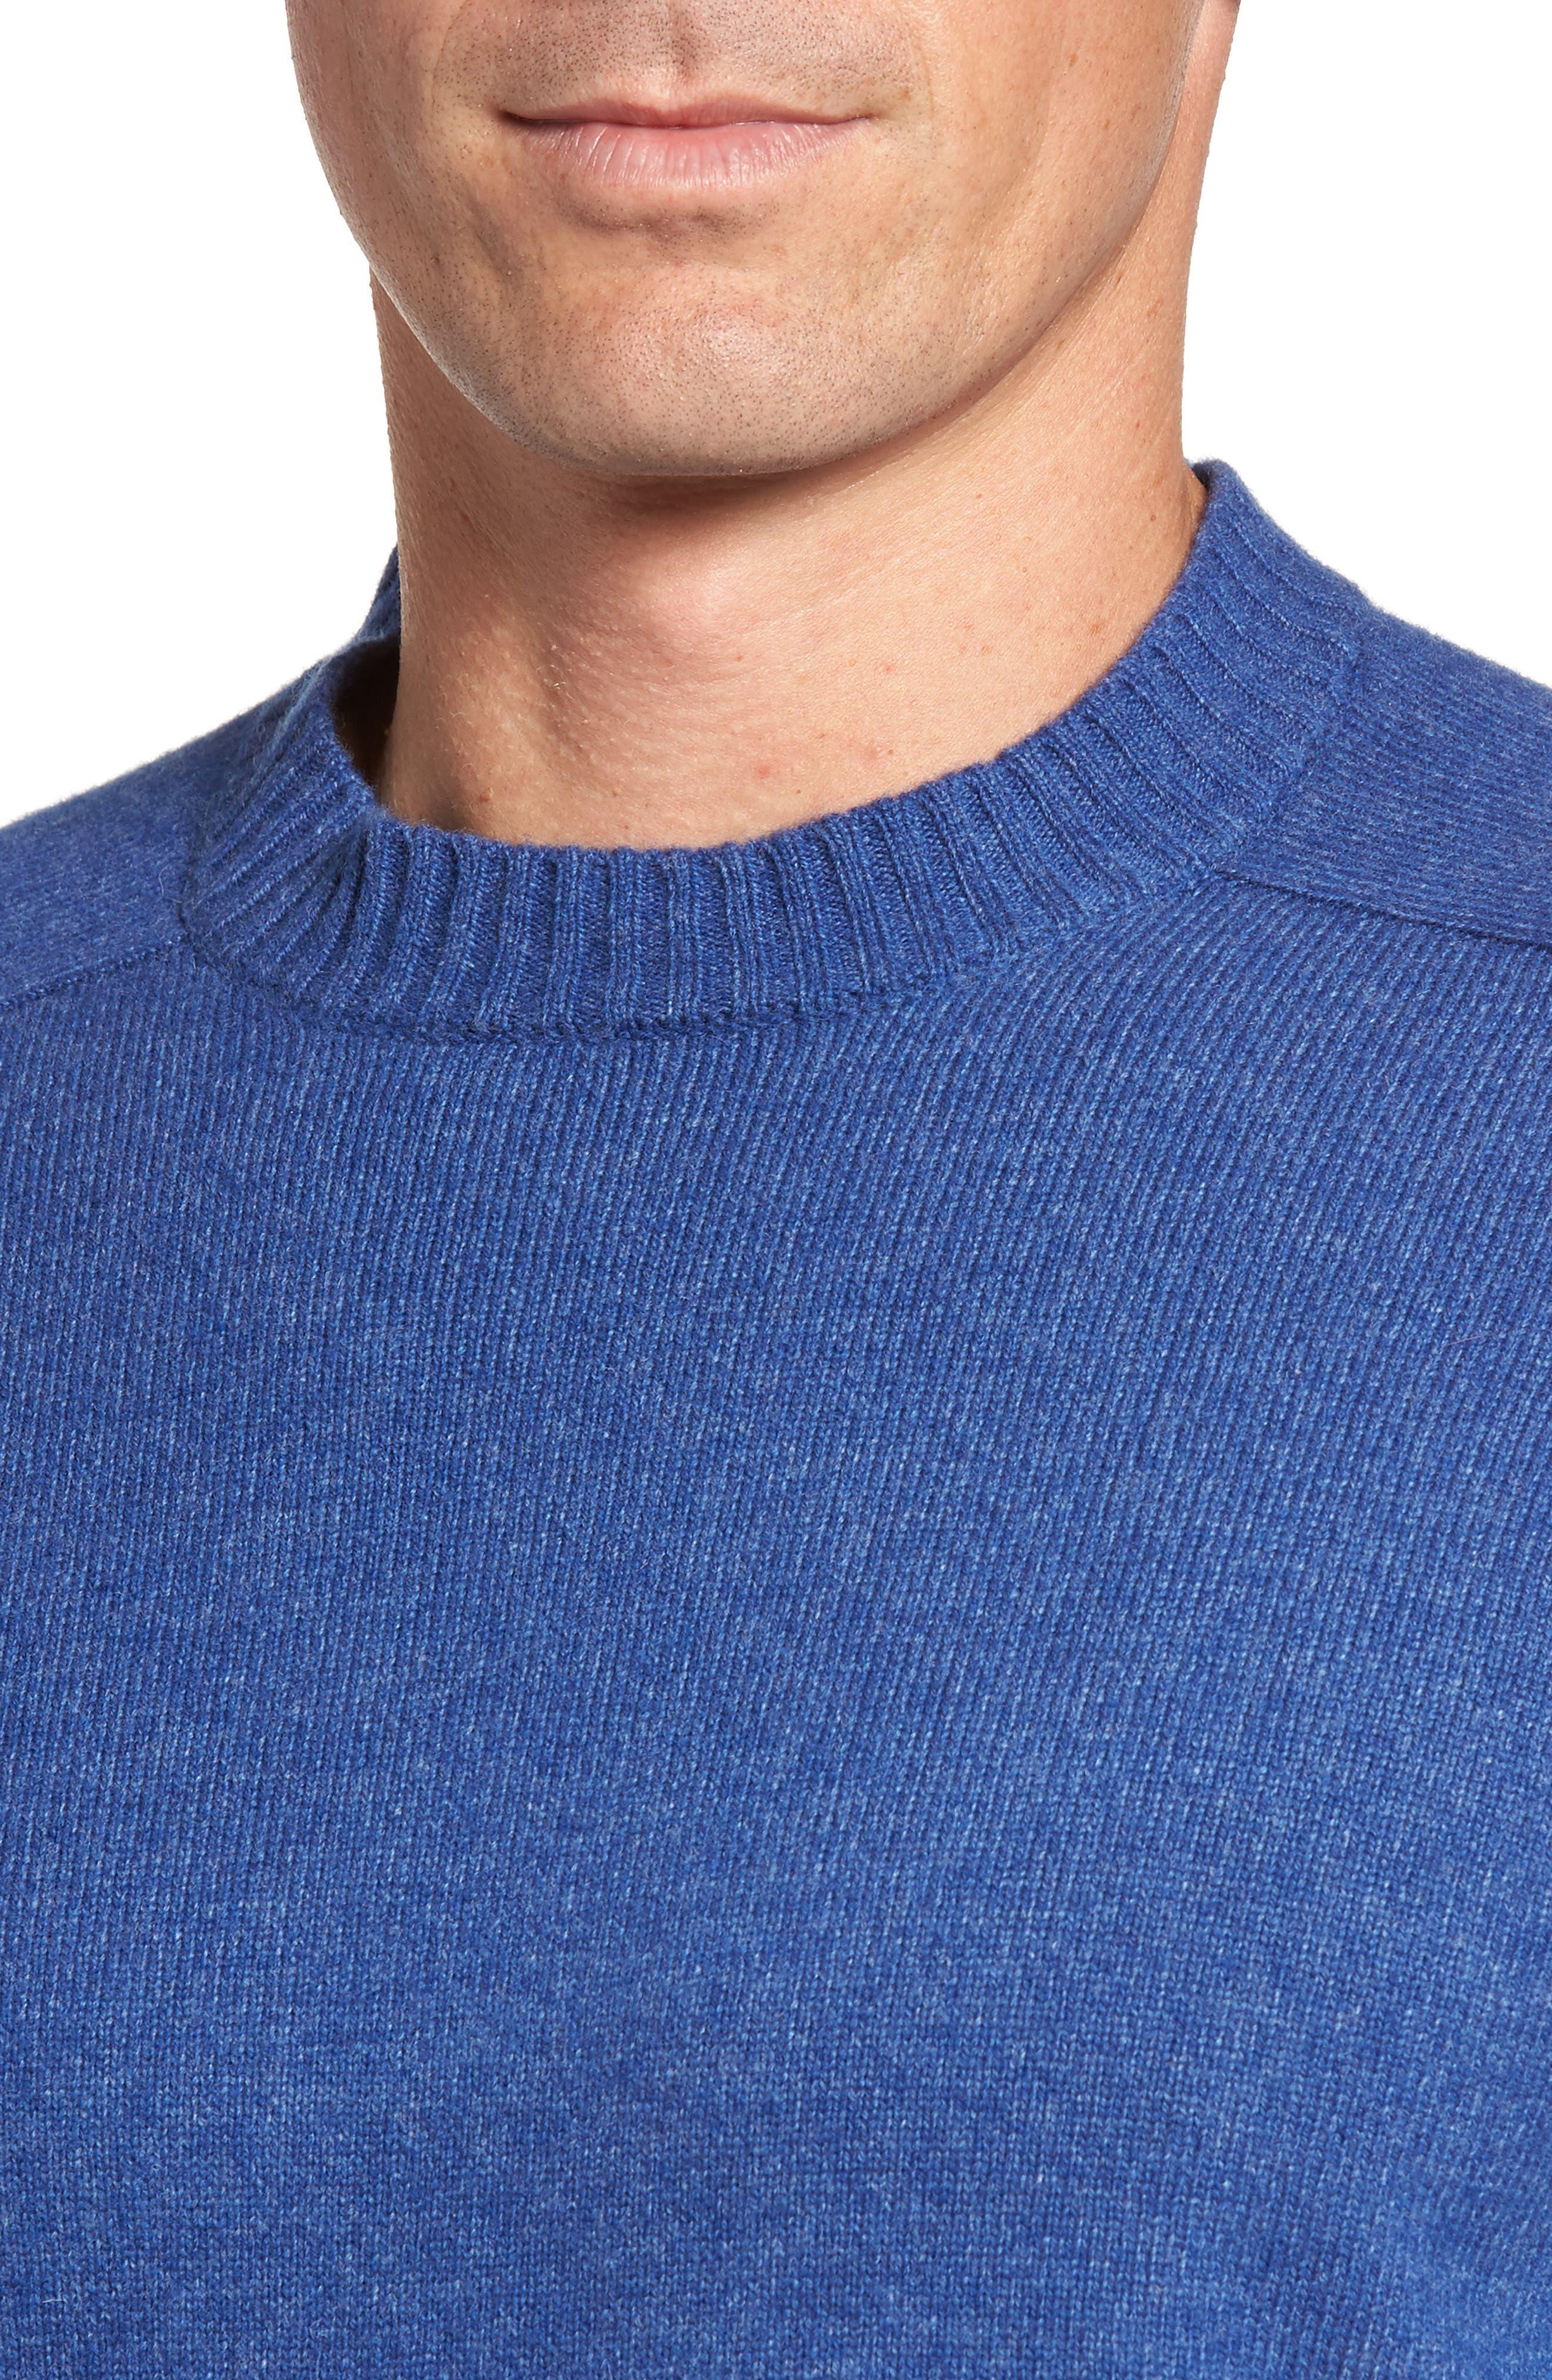 Crown Vintage Crewneck Sweatshirt,                             Alternate thumbnail 8, color,